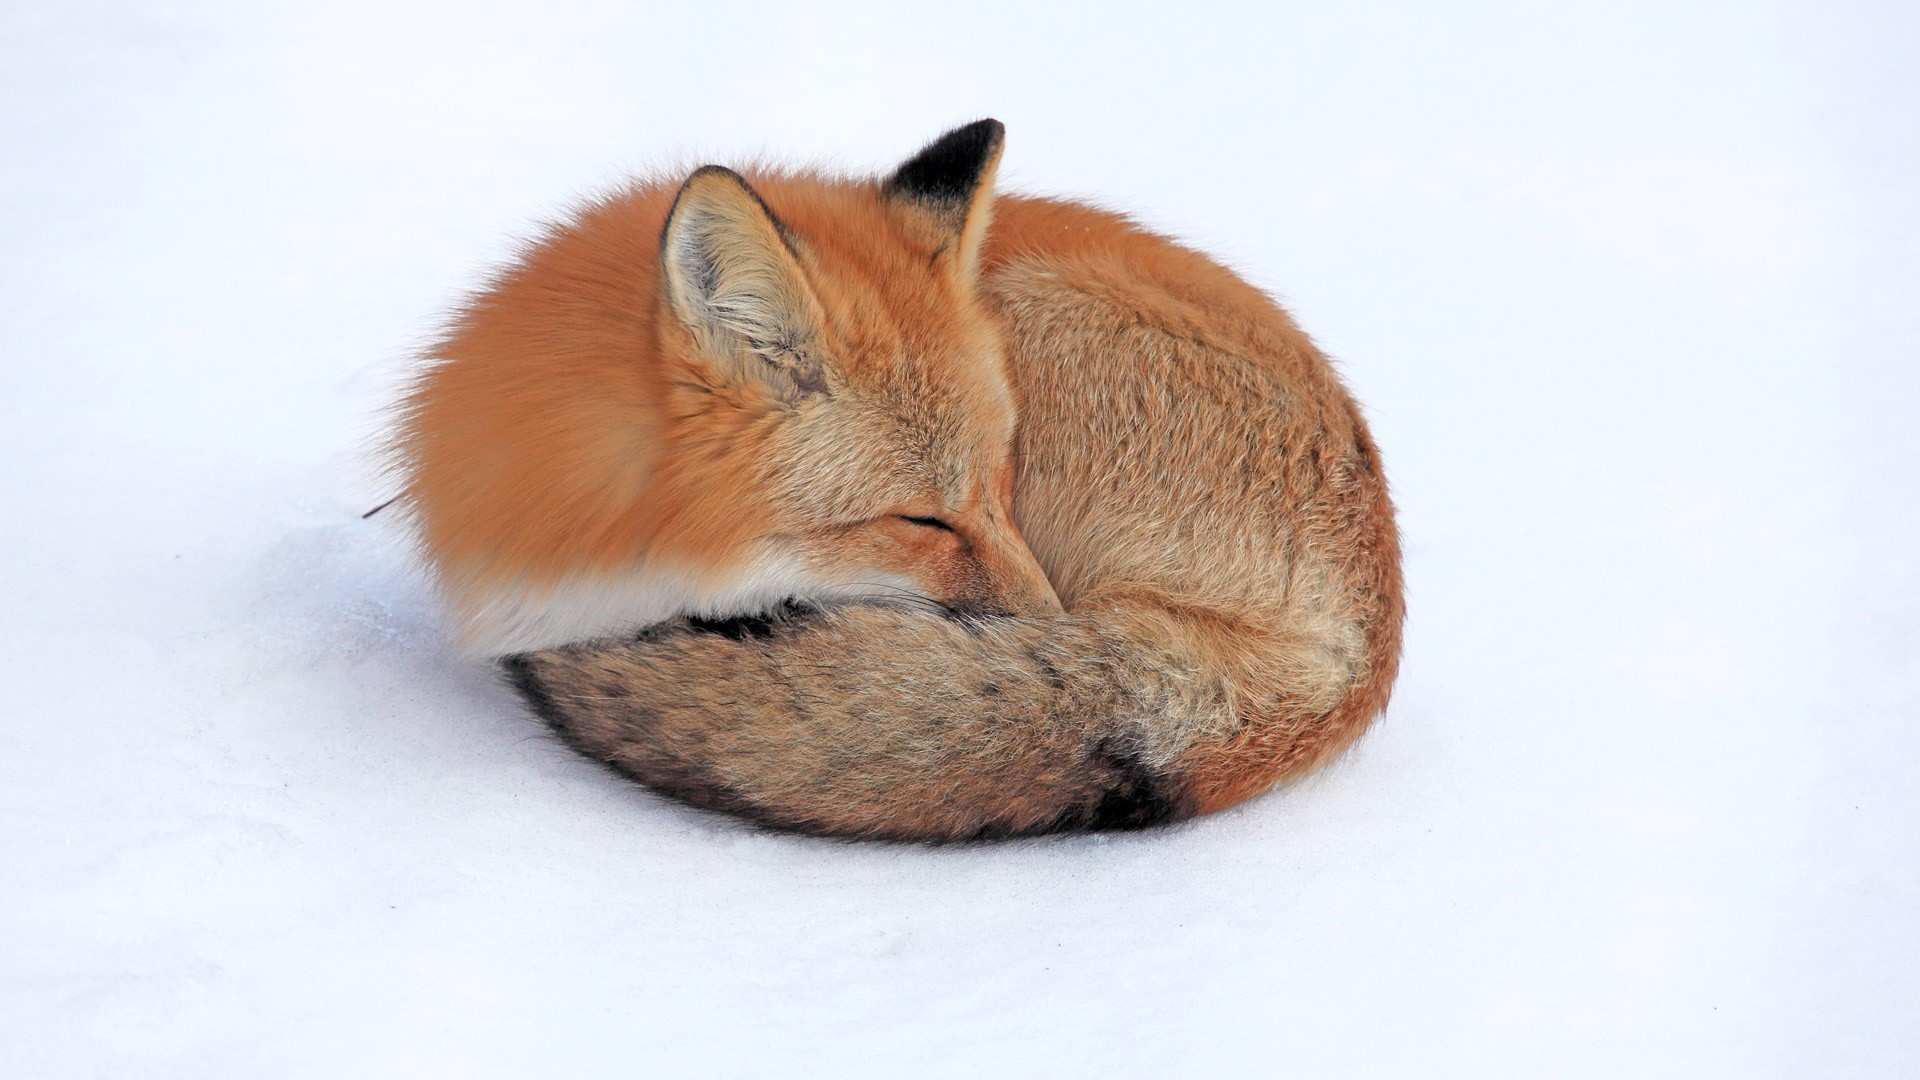 Fox Laptop Wallpapers